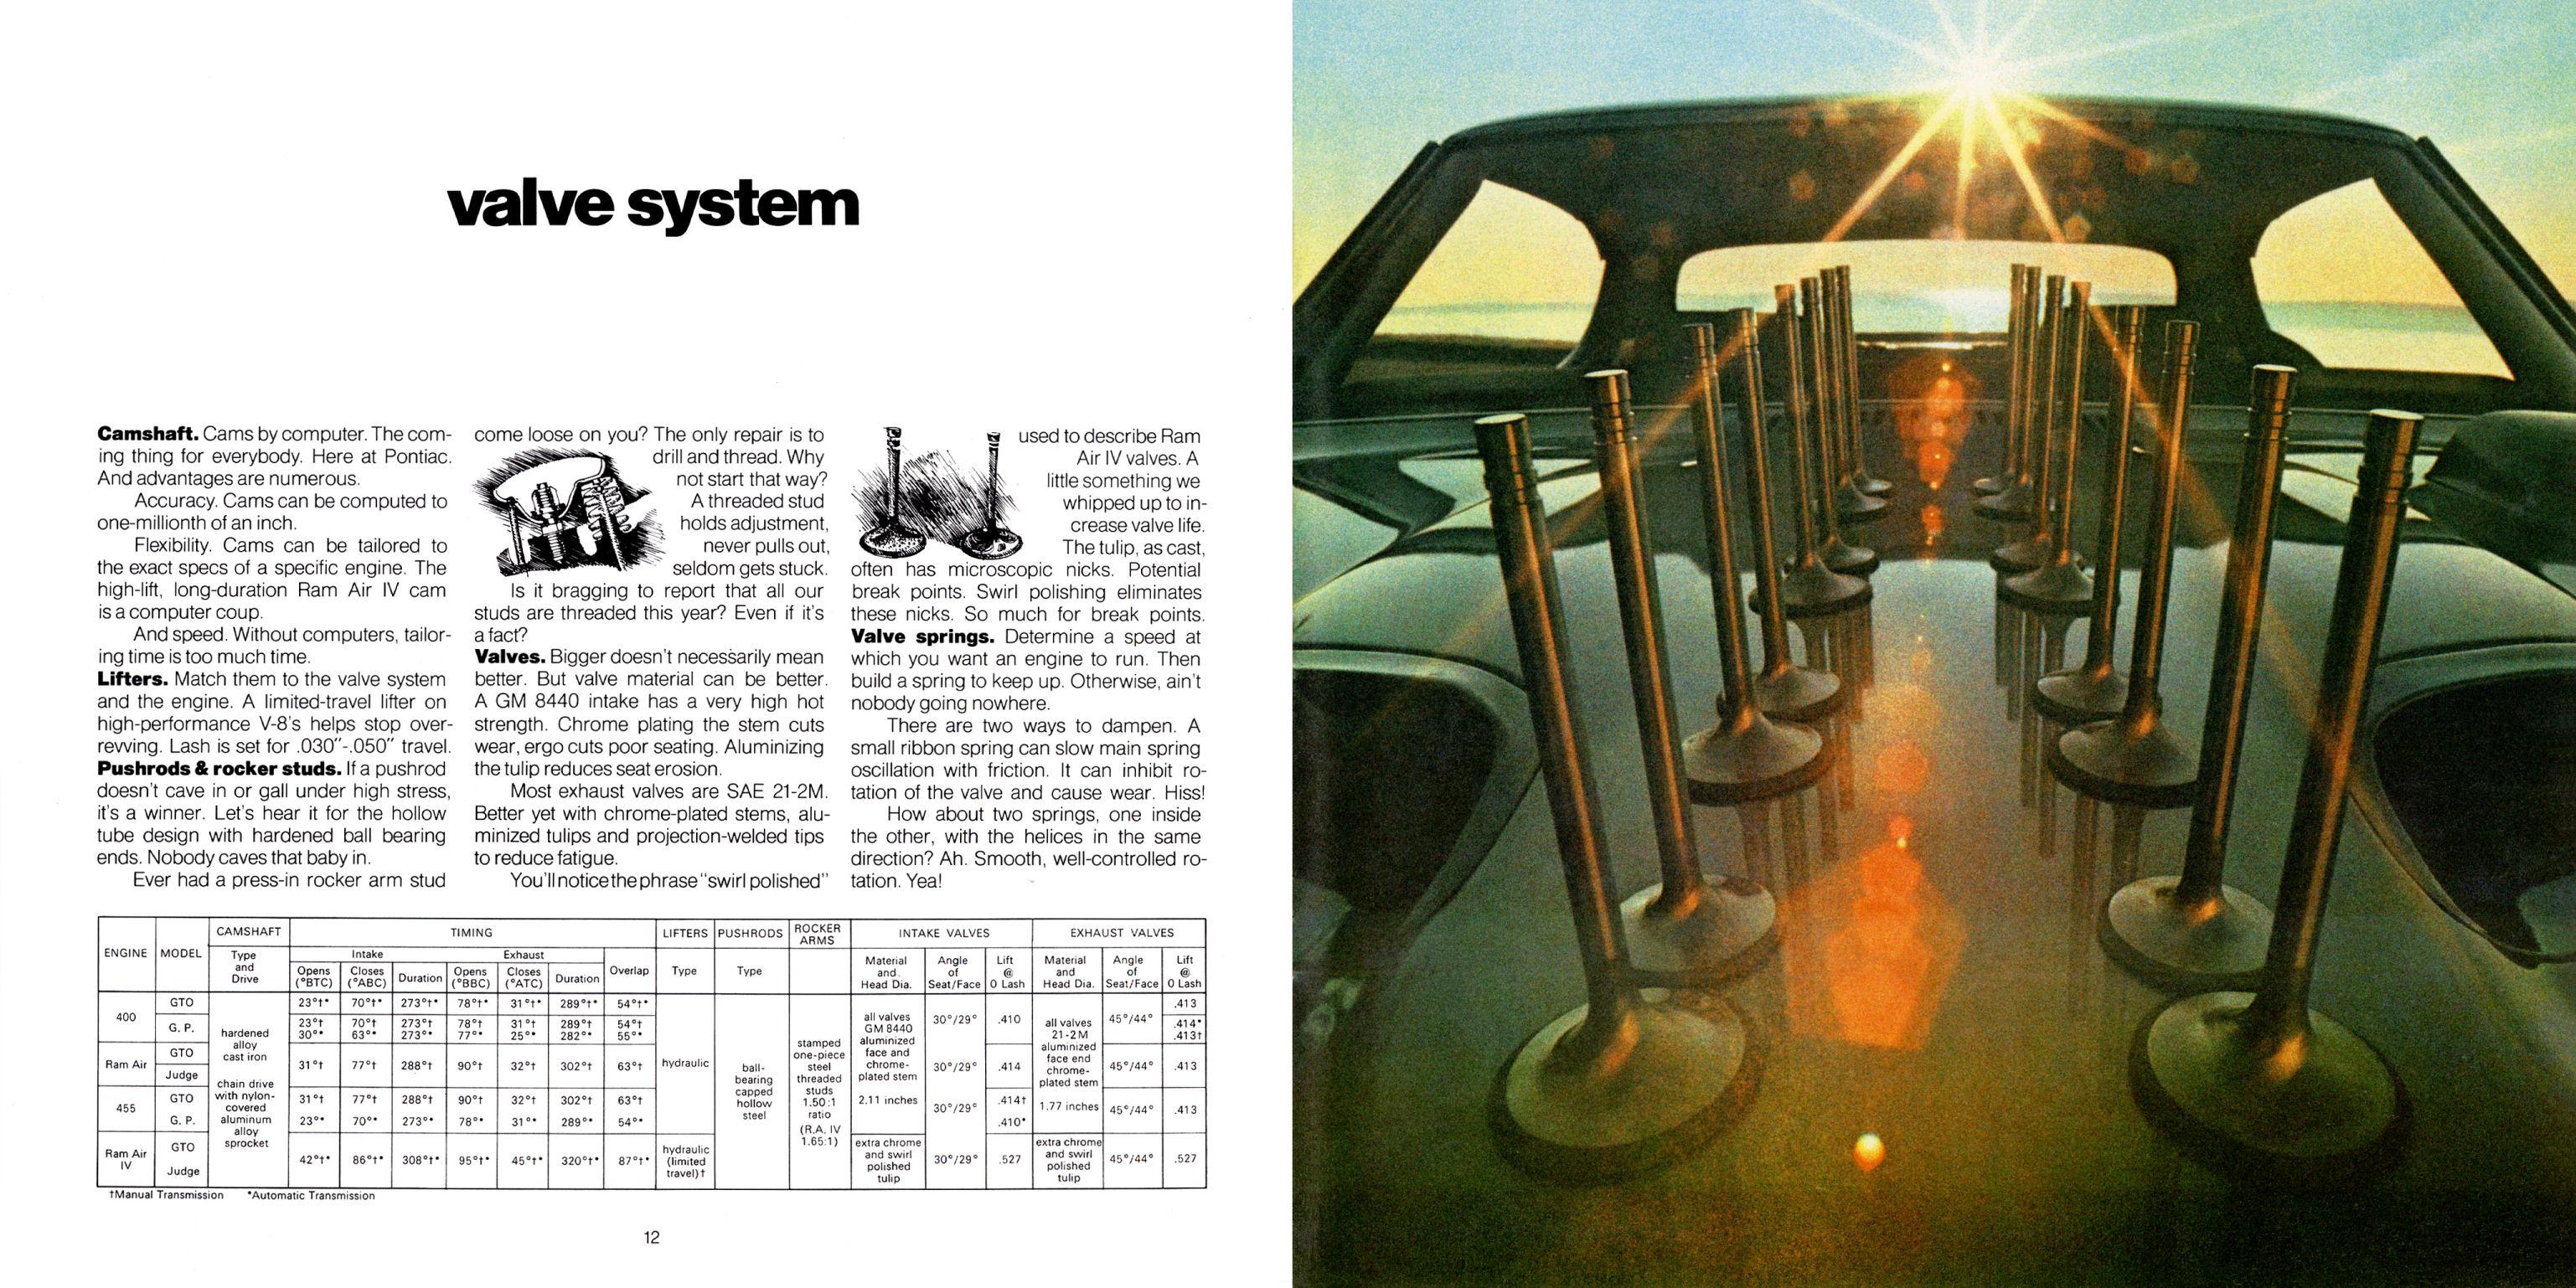 1970%20Pontiac%20Performance-12-13.jpg